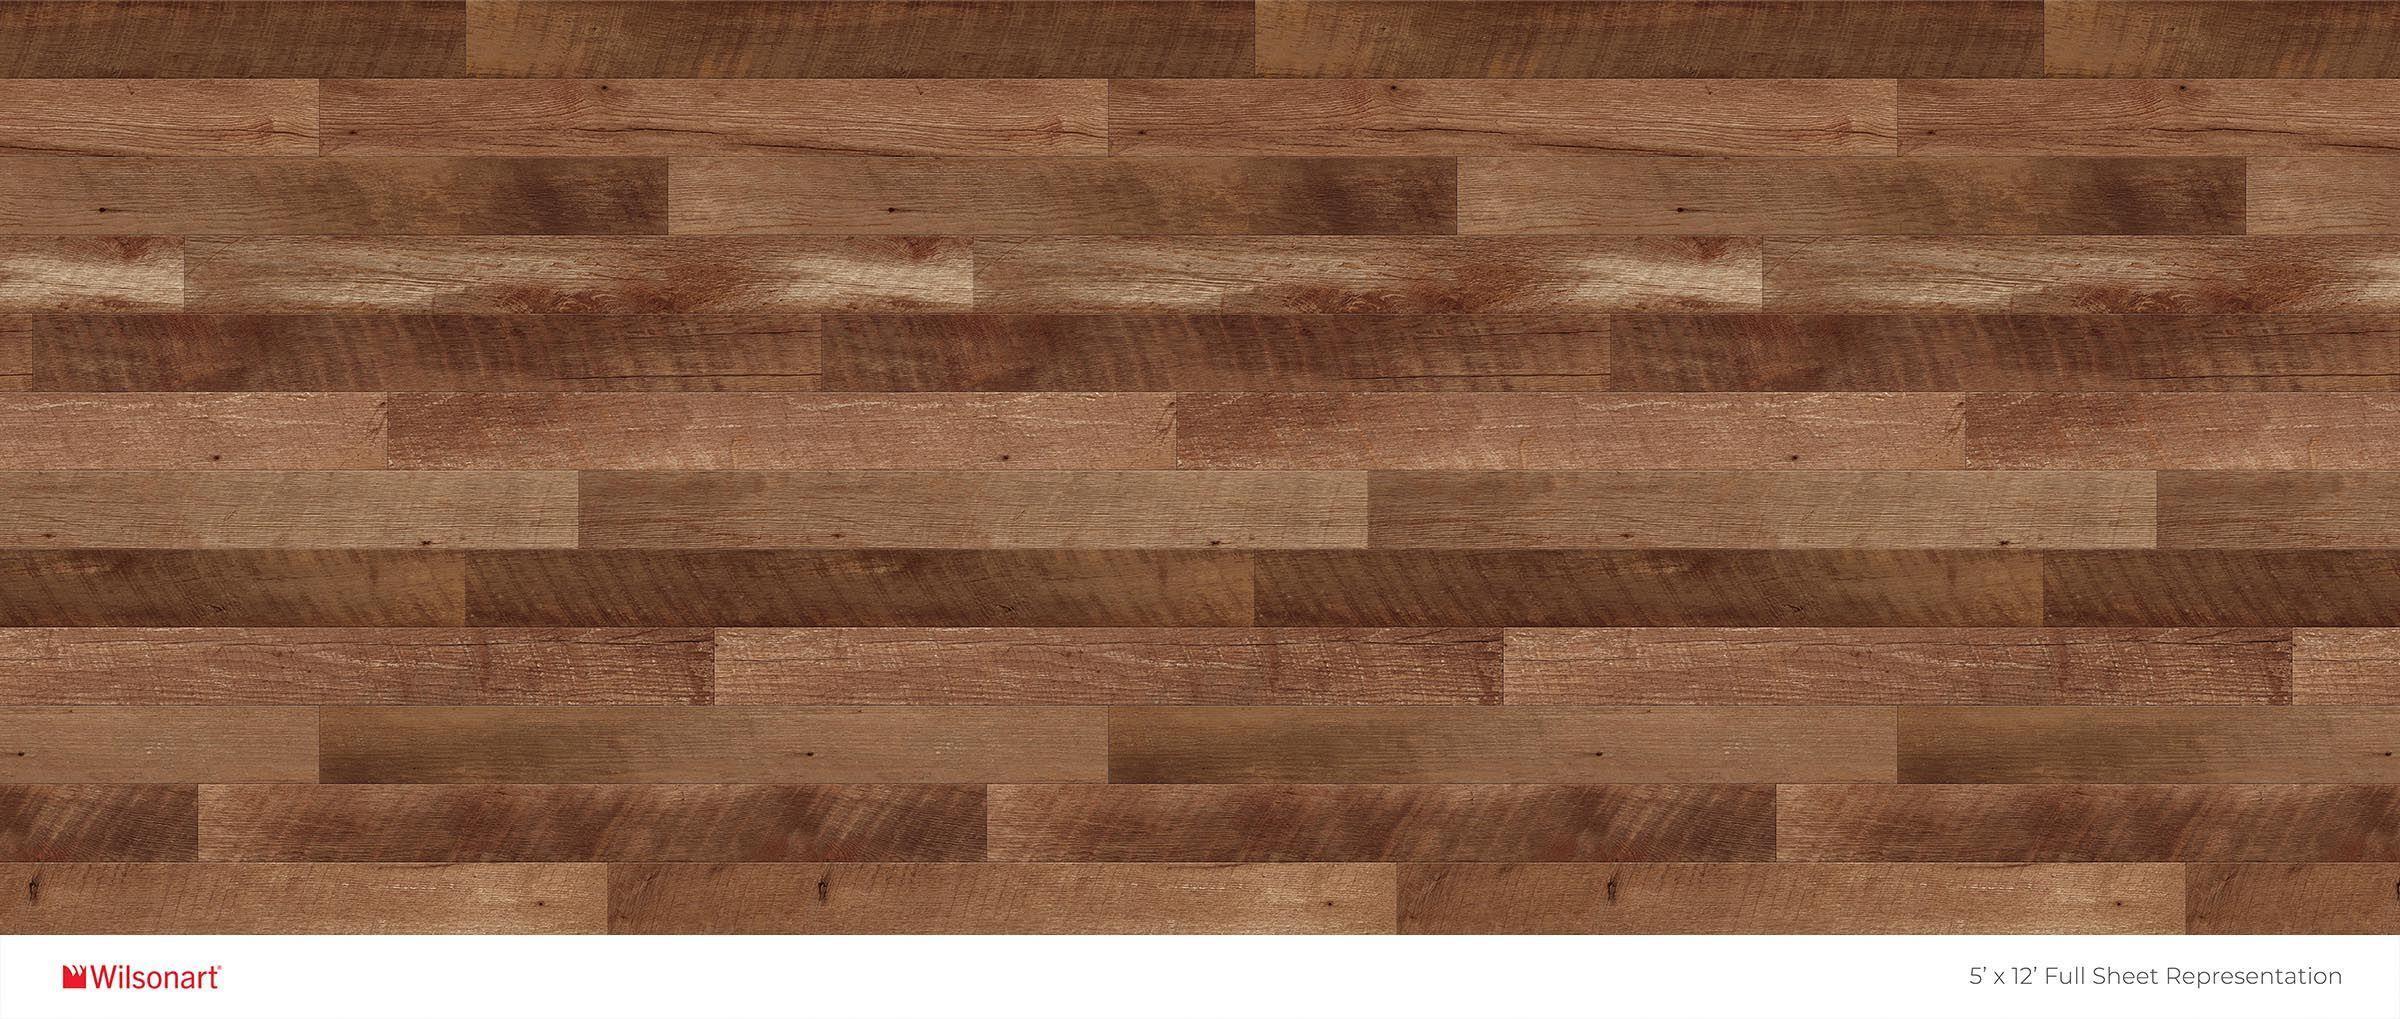 Planked Coffee Oak 4 x 8 Formica Sheet Laminate